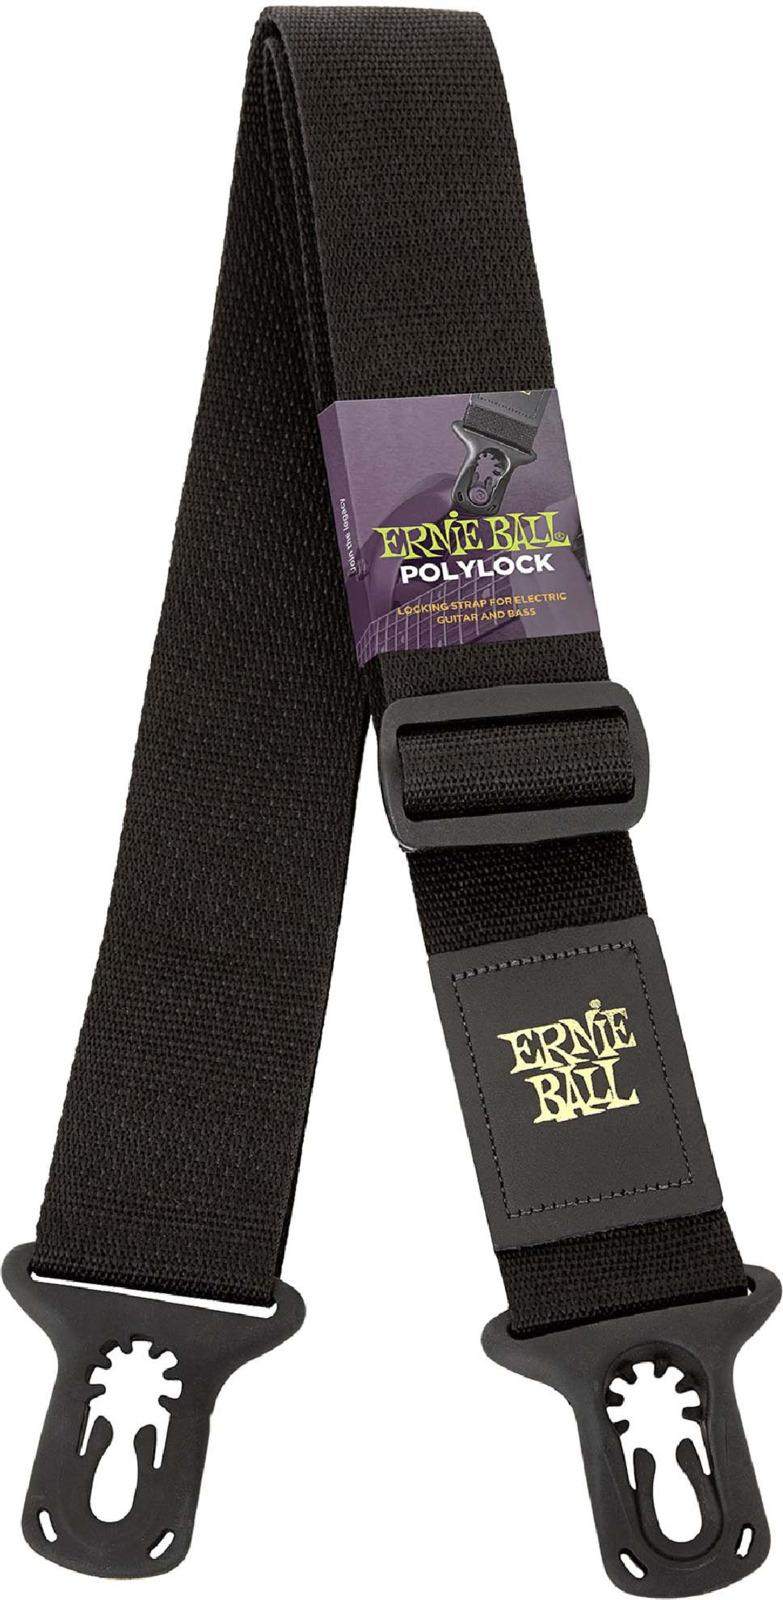 Ремень для гитары Ernie Ball, с защелкой, P04056, черный цена